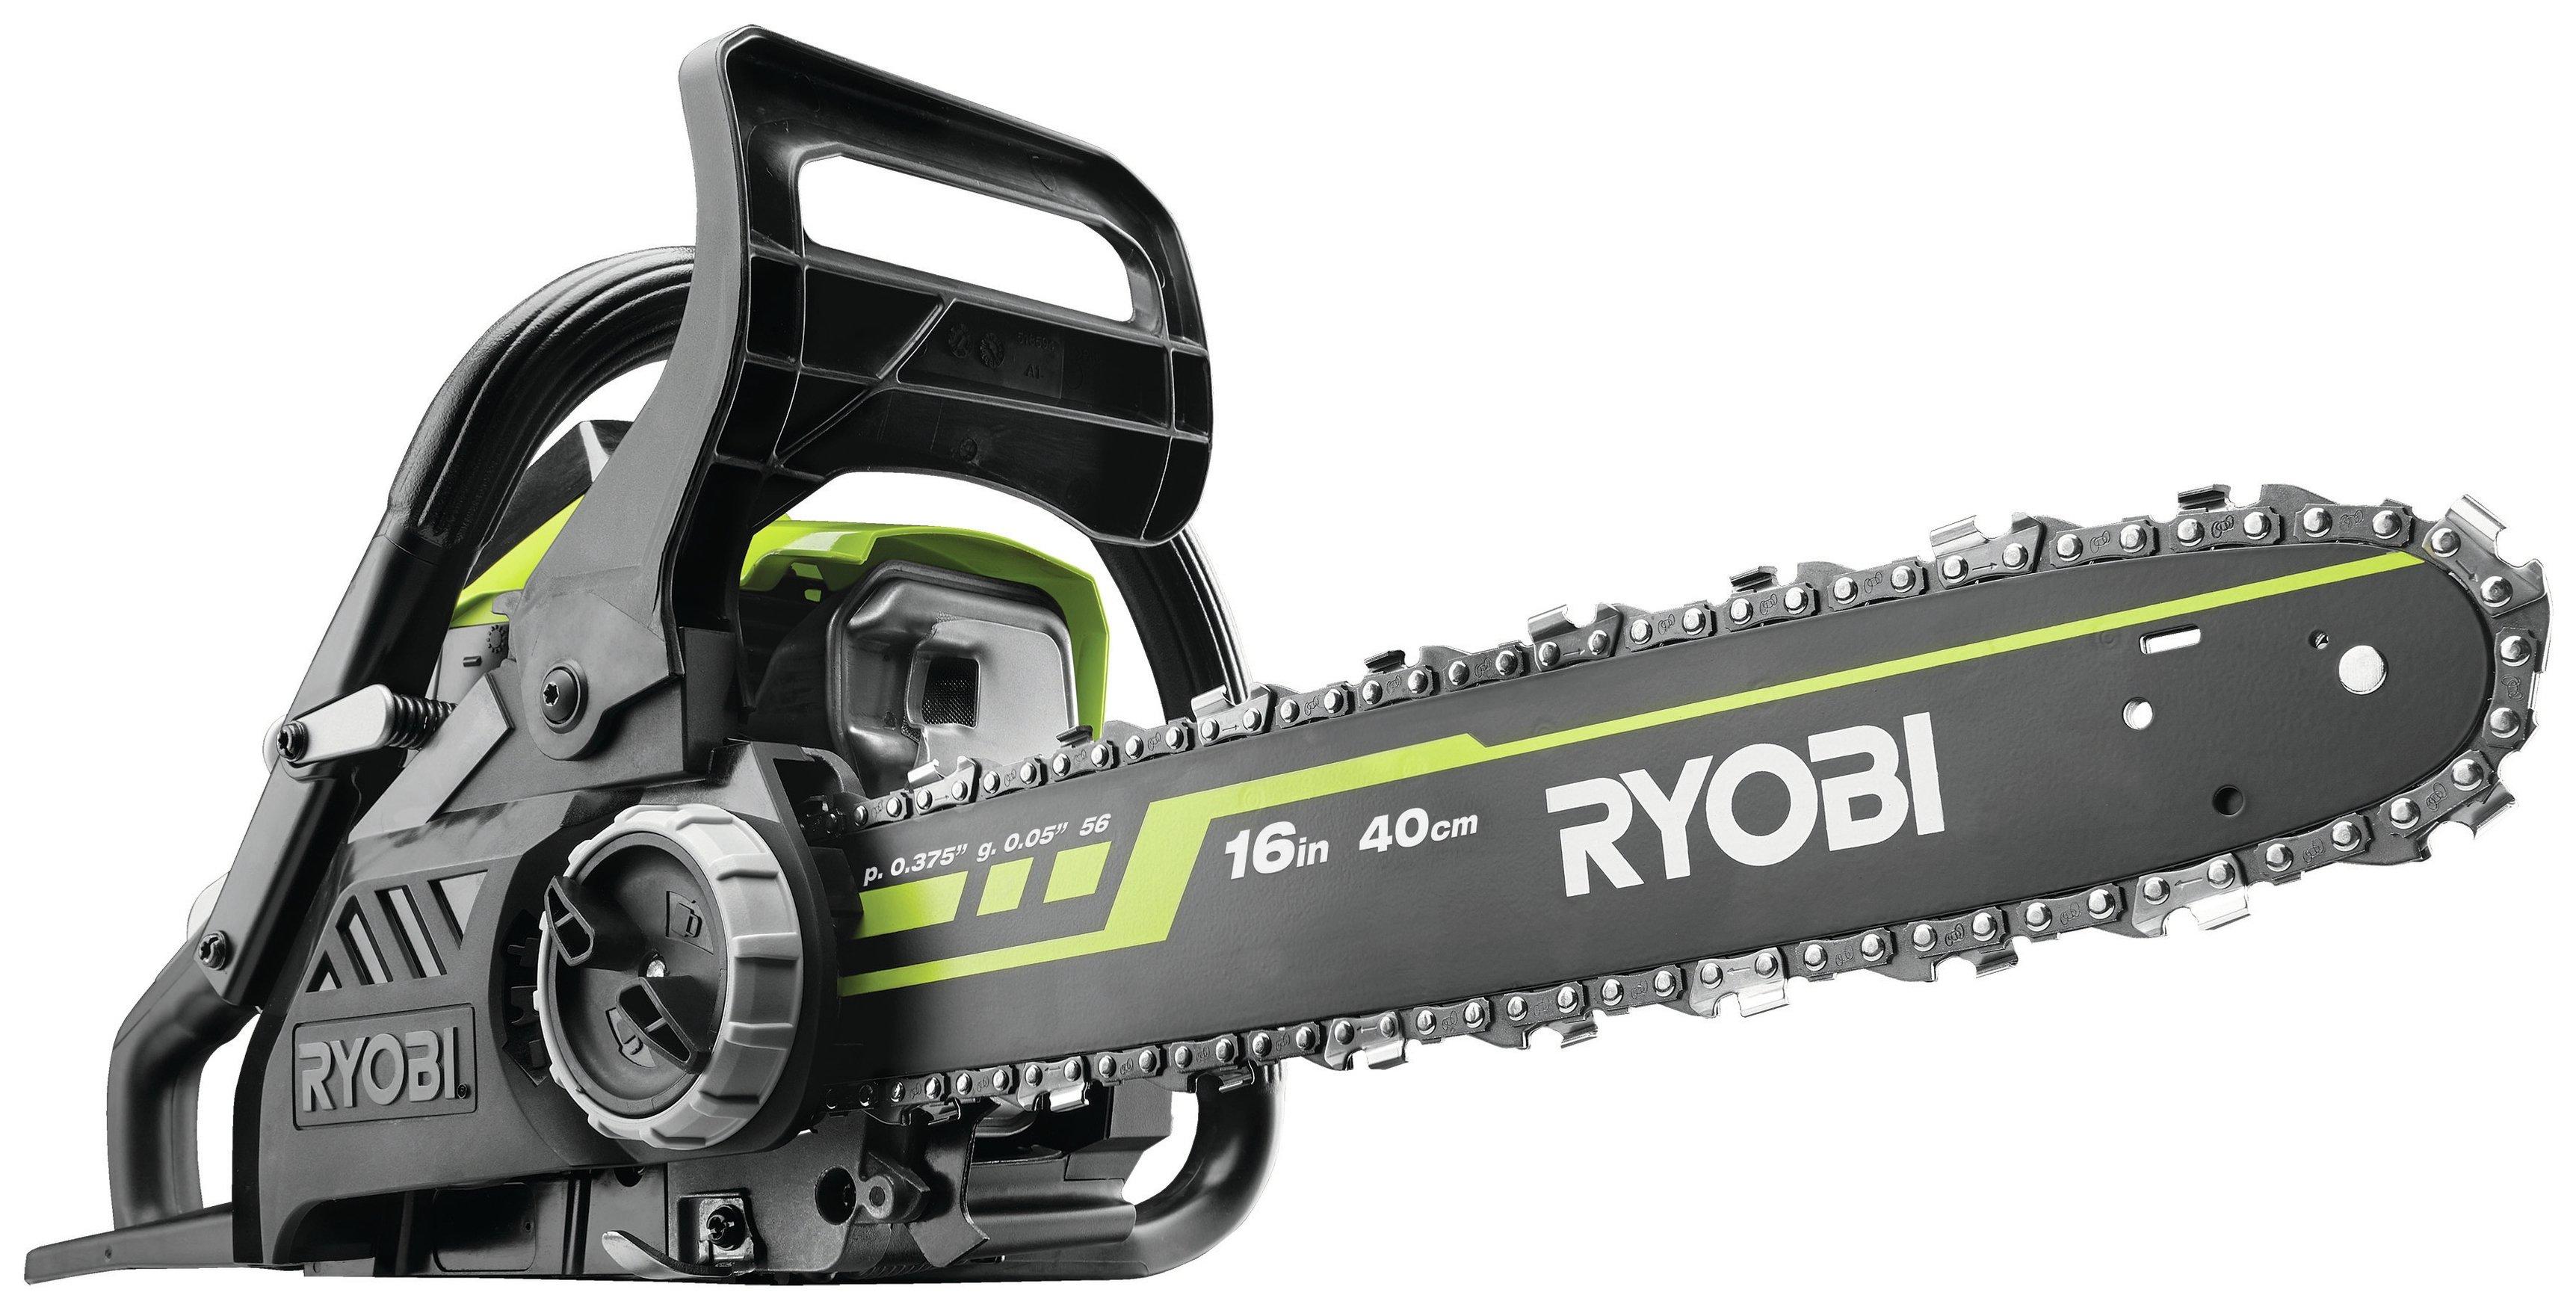 Ryobi - RCS3840T Petrol Chainsaw - 38cc